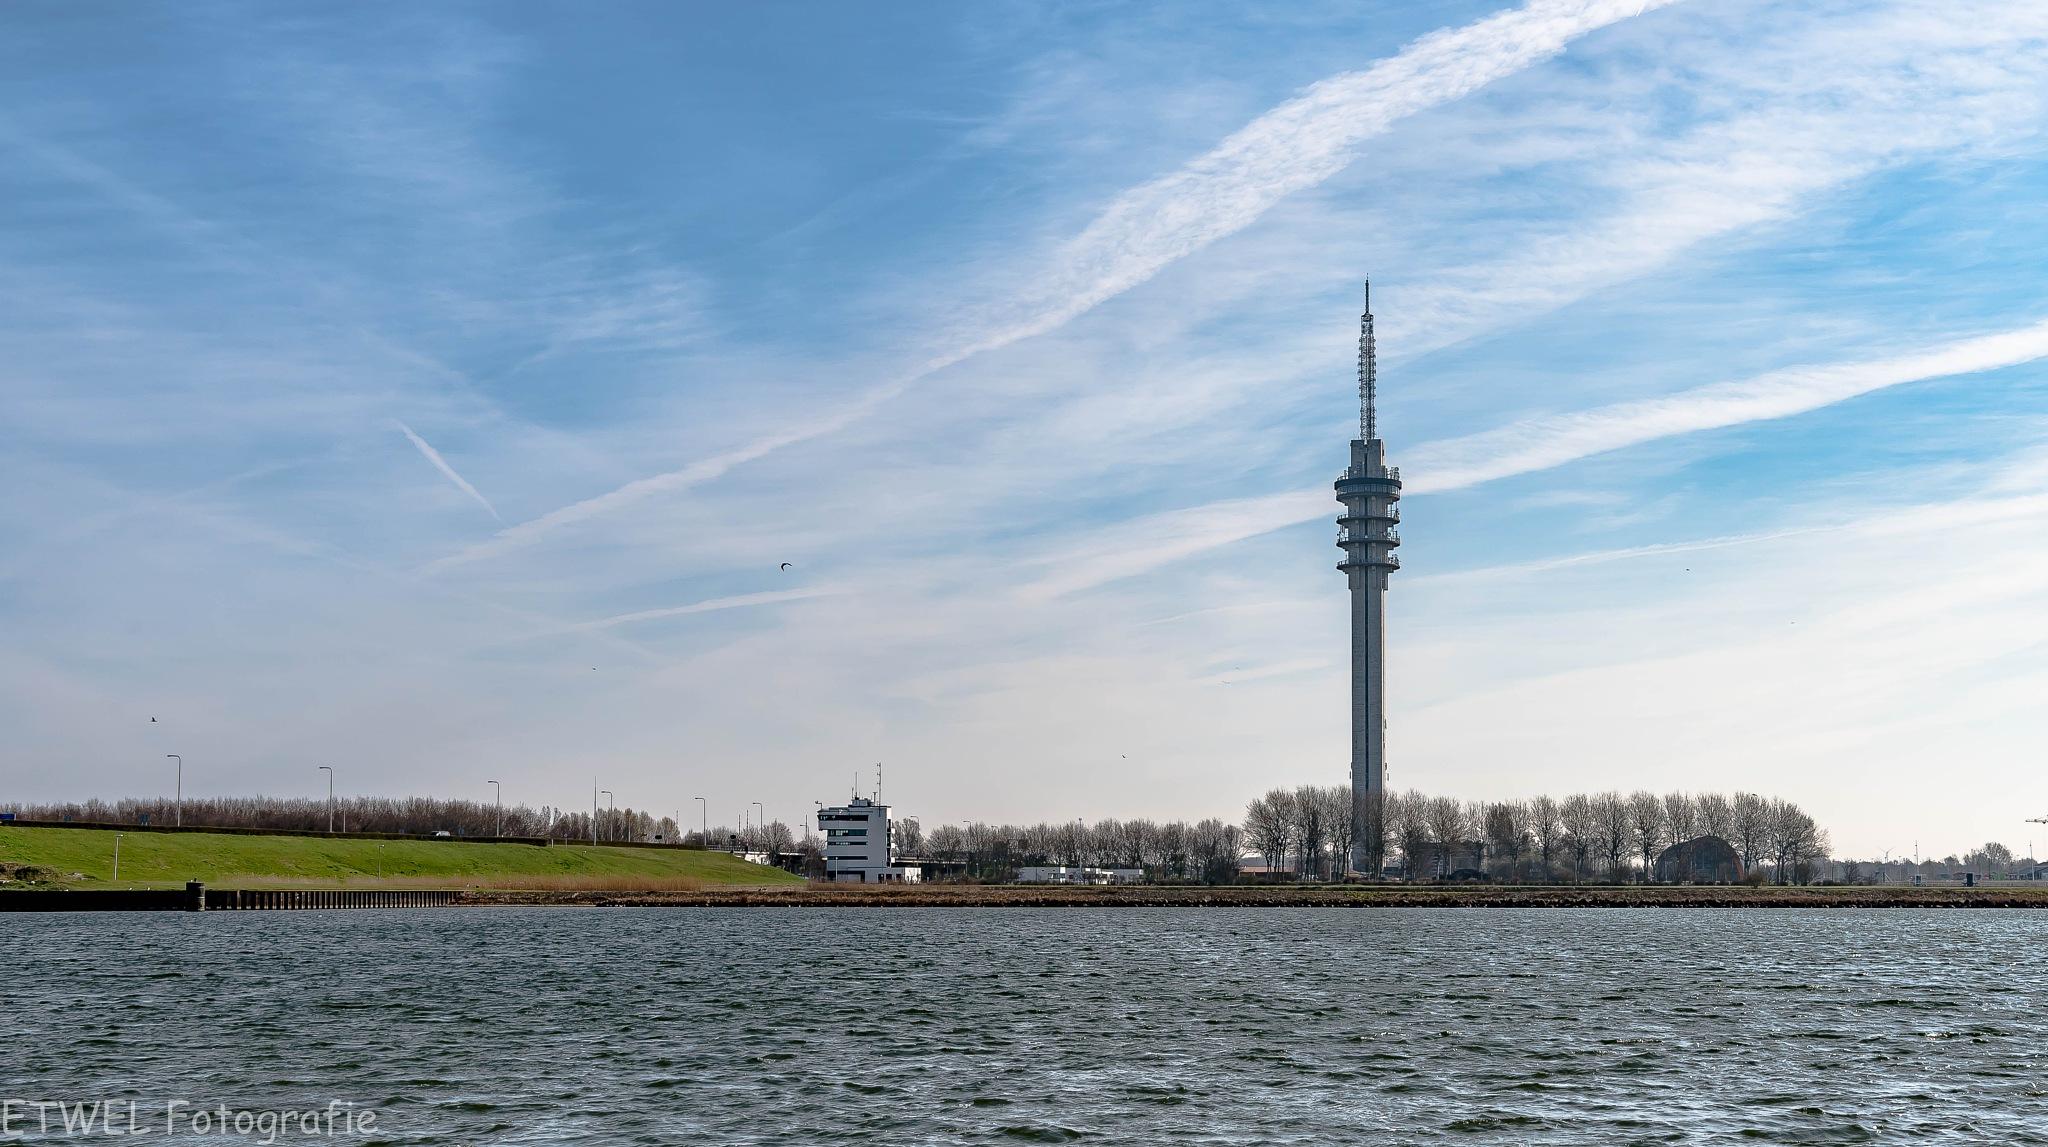 Telecom Tower by ETWEL